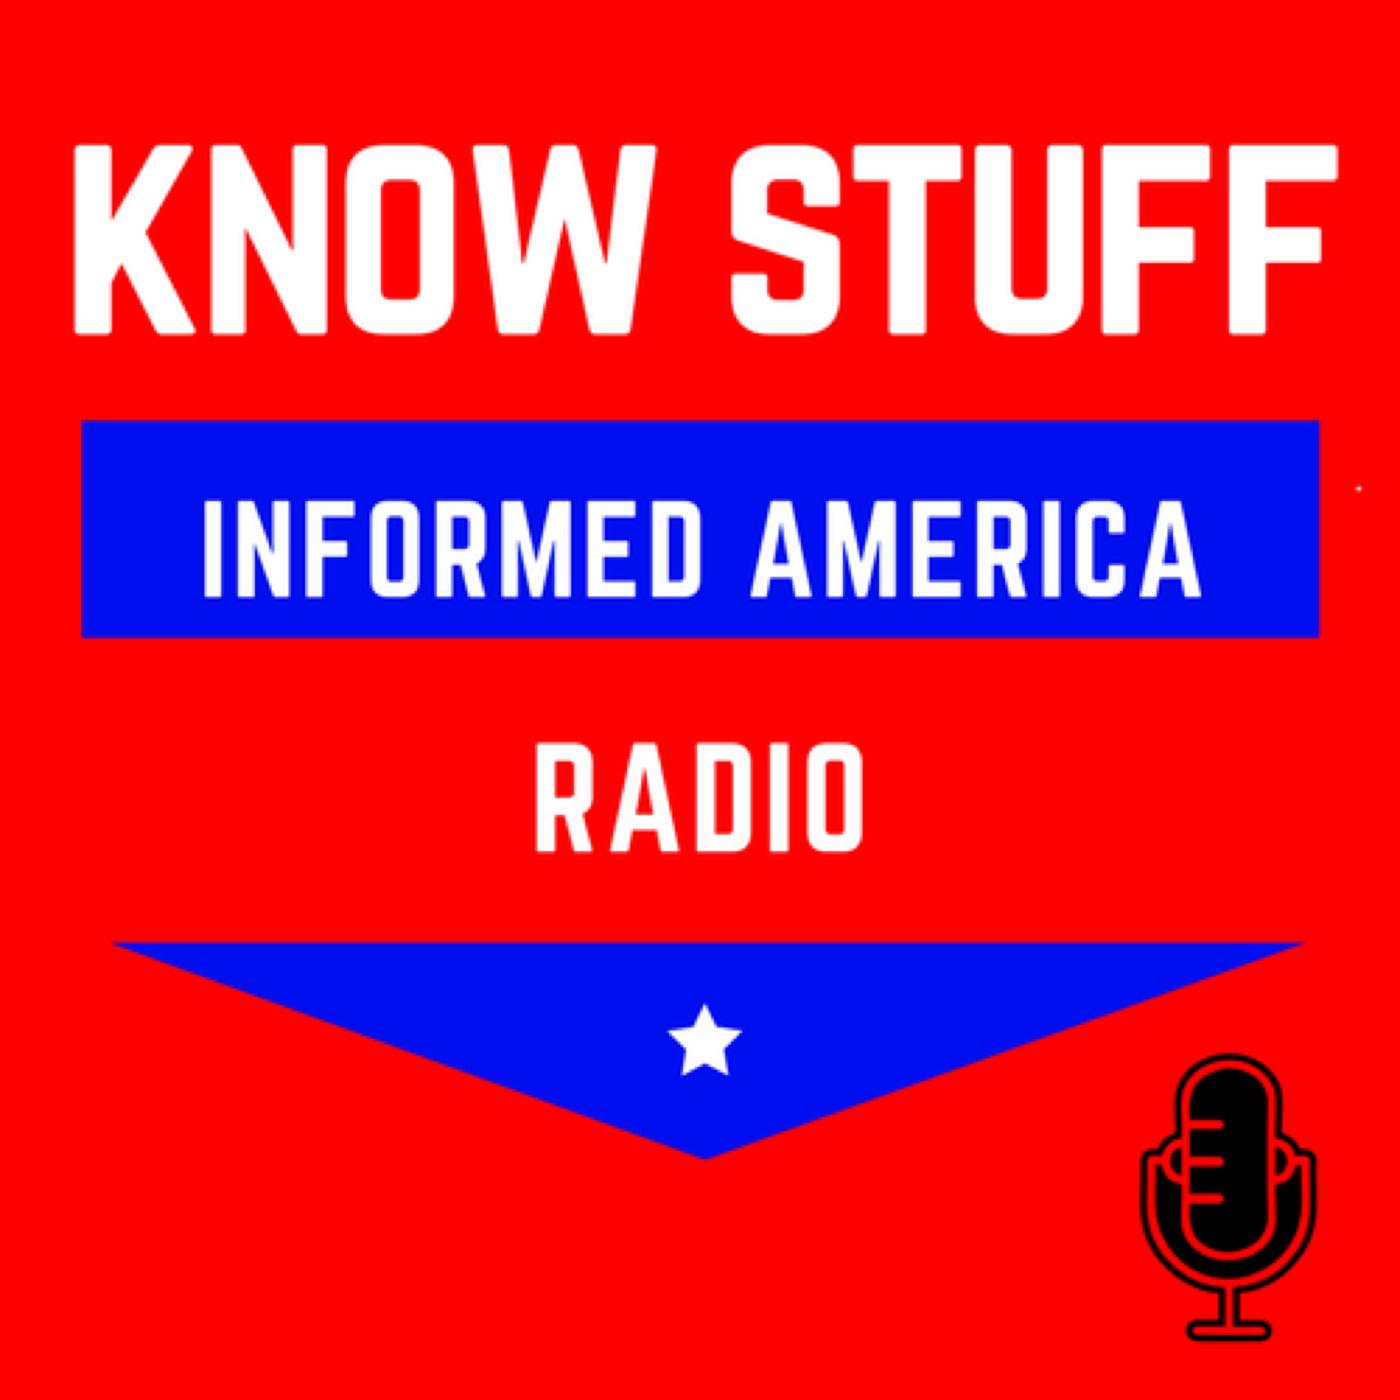 Informed America Radio